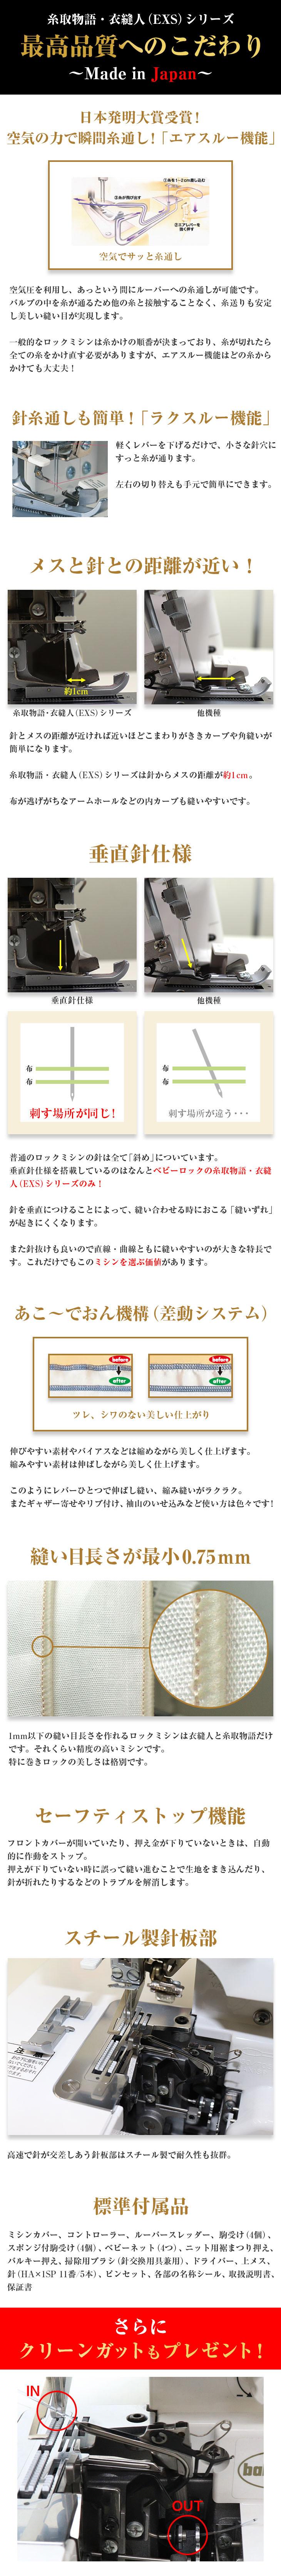 BL5700EXS 最高品質へのこだわり 〜Made in Japan〜